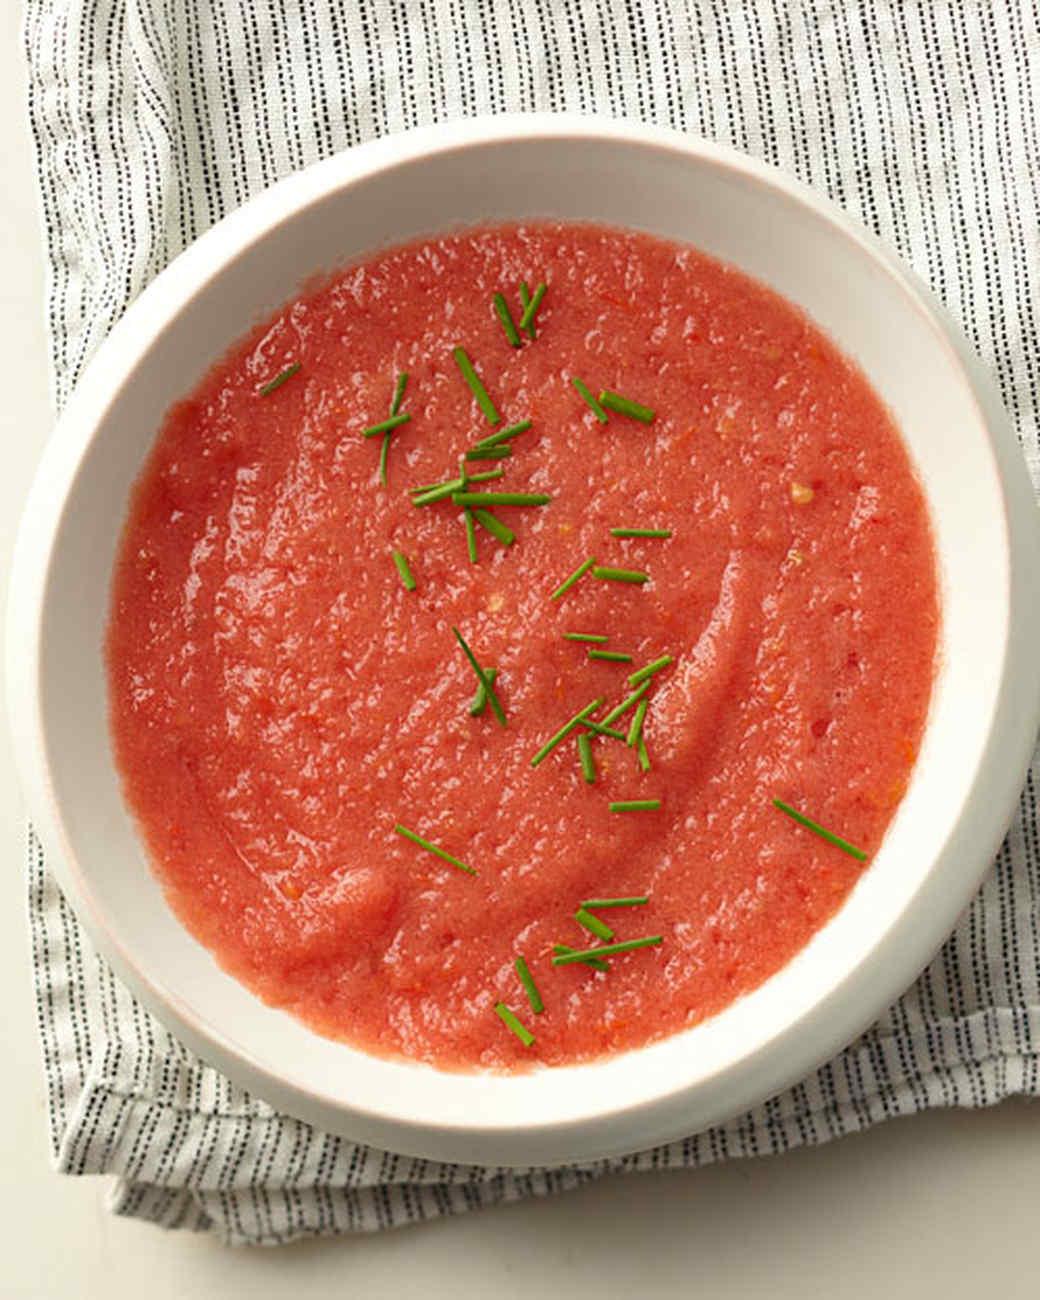 Tomato-Peach Gazpacho